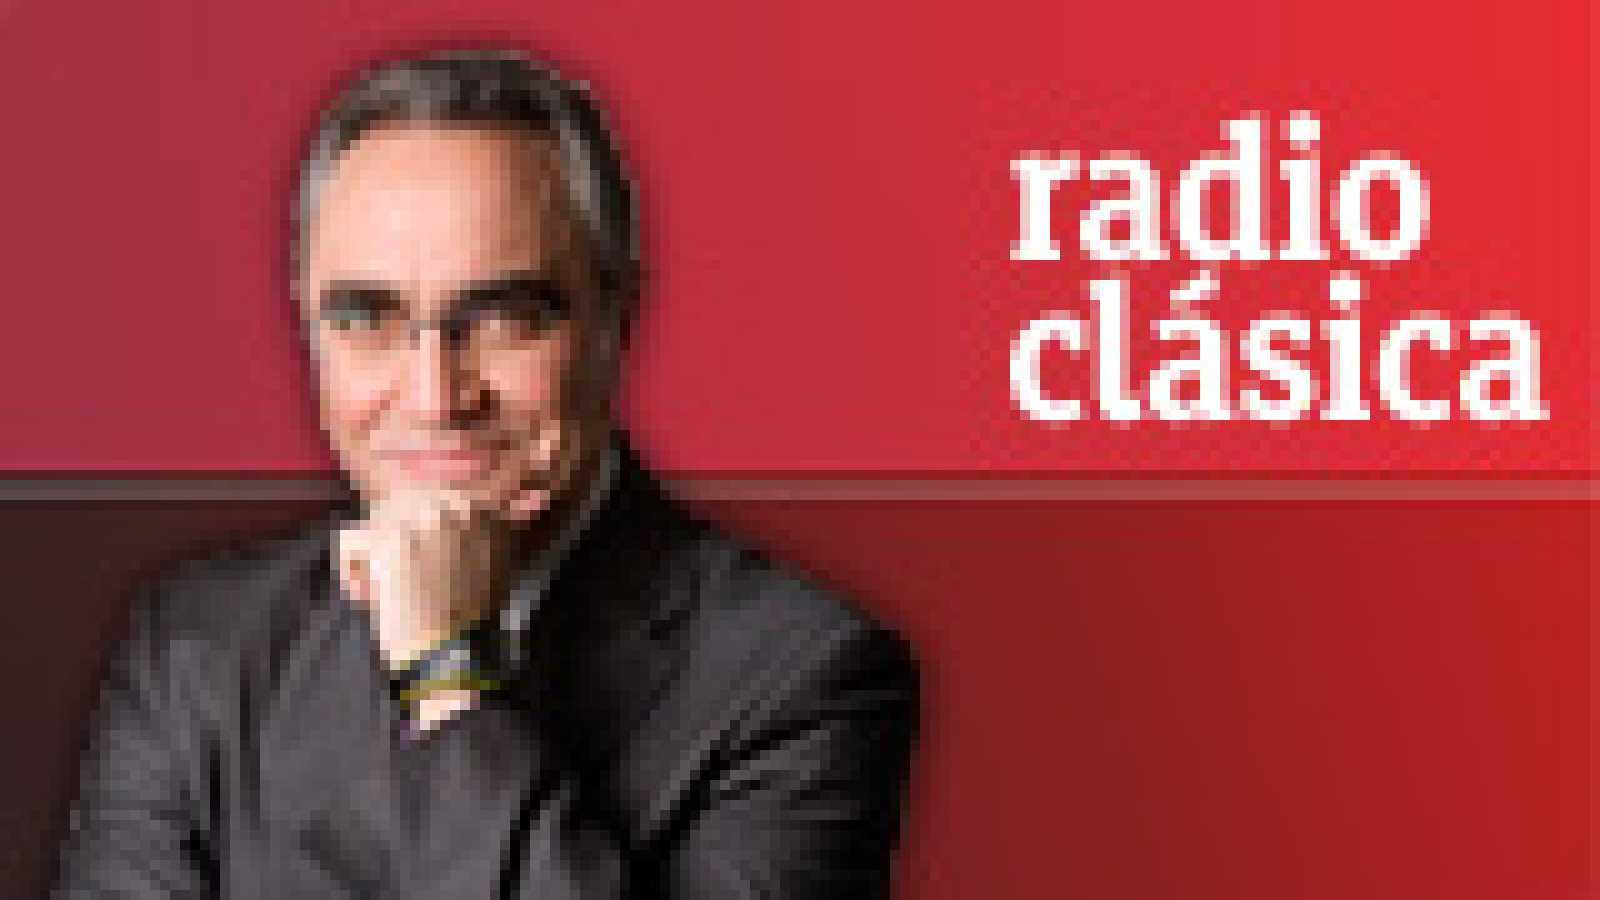 Álbum de discos - Orquesta de Cadaqués - 21/04/12 - escuchar ahora